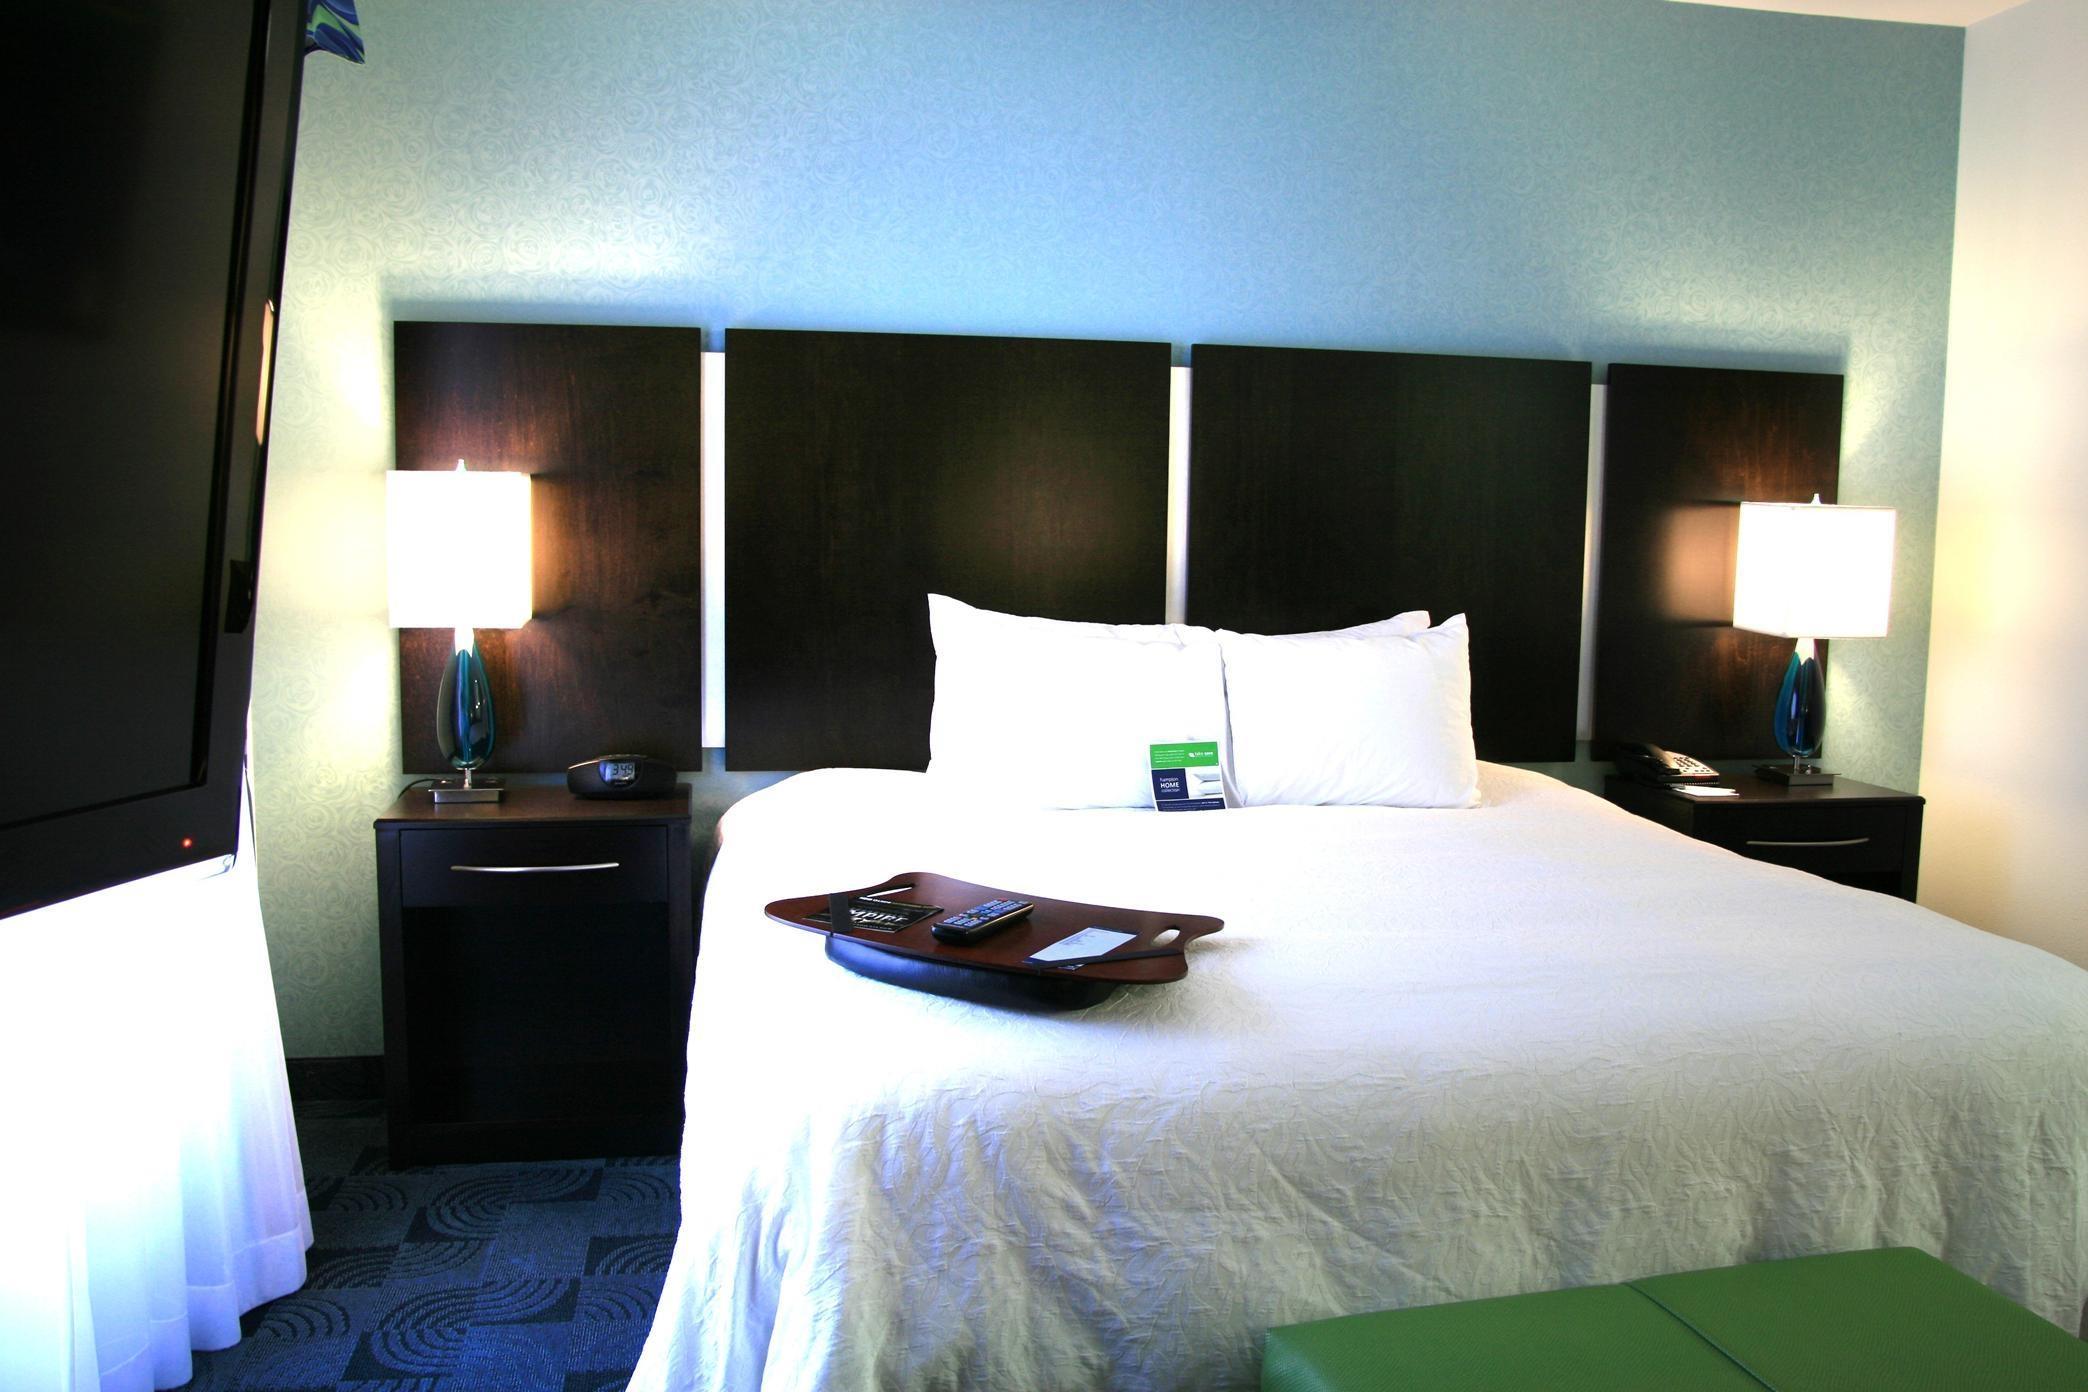 Hampton Inn & Suites Dallas/Lewisville-Vista Ridge Mall, TX image 22